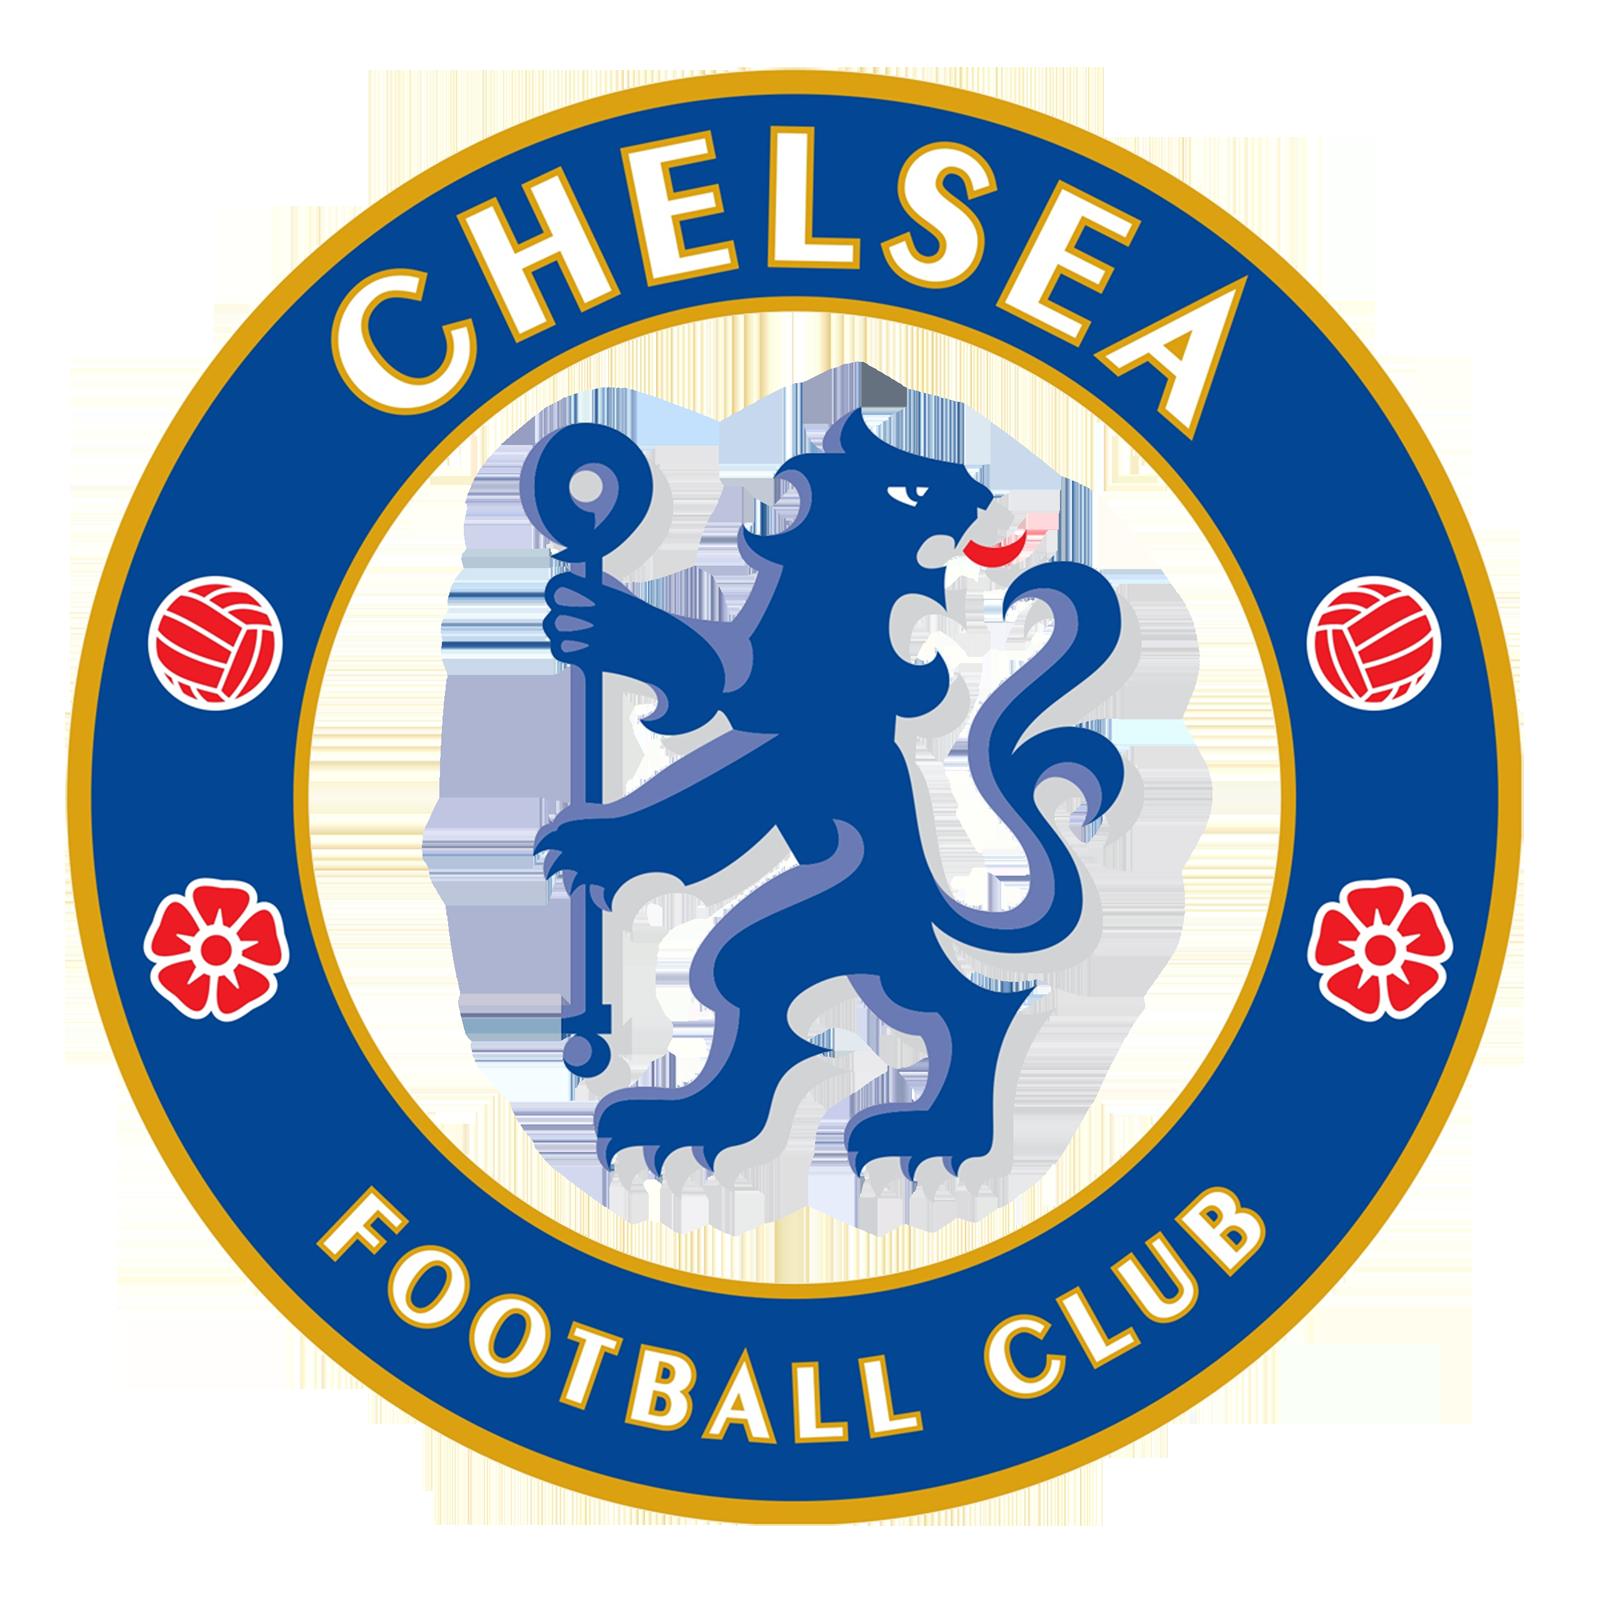 chelsea logo png 1